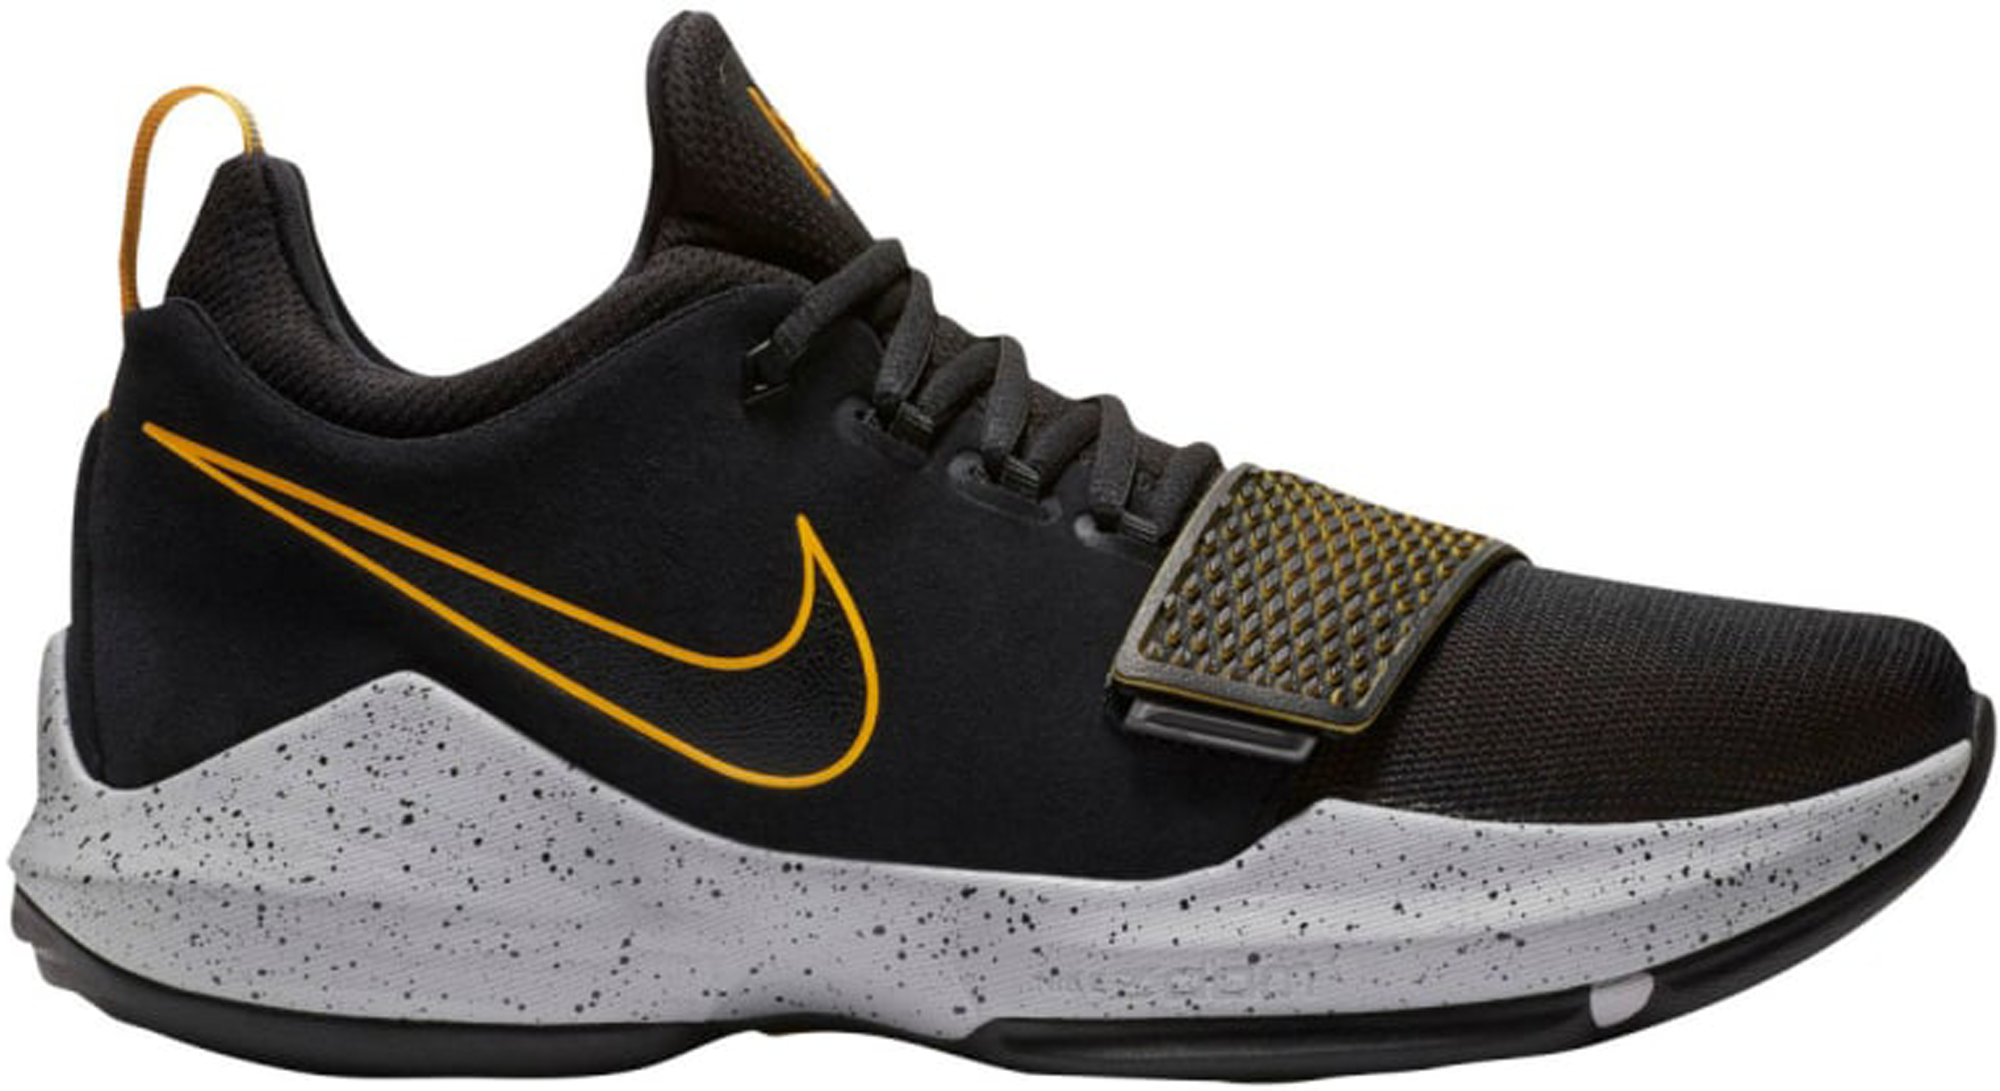 Nike PG 1 Black University Gold